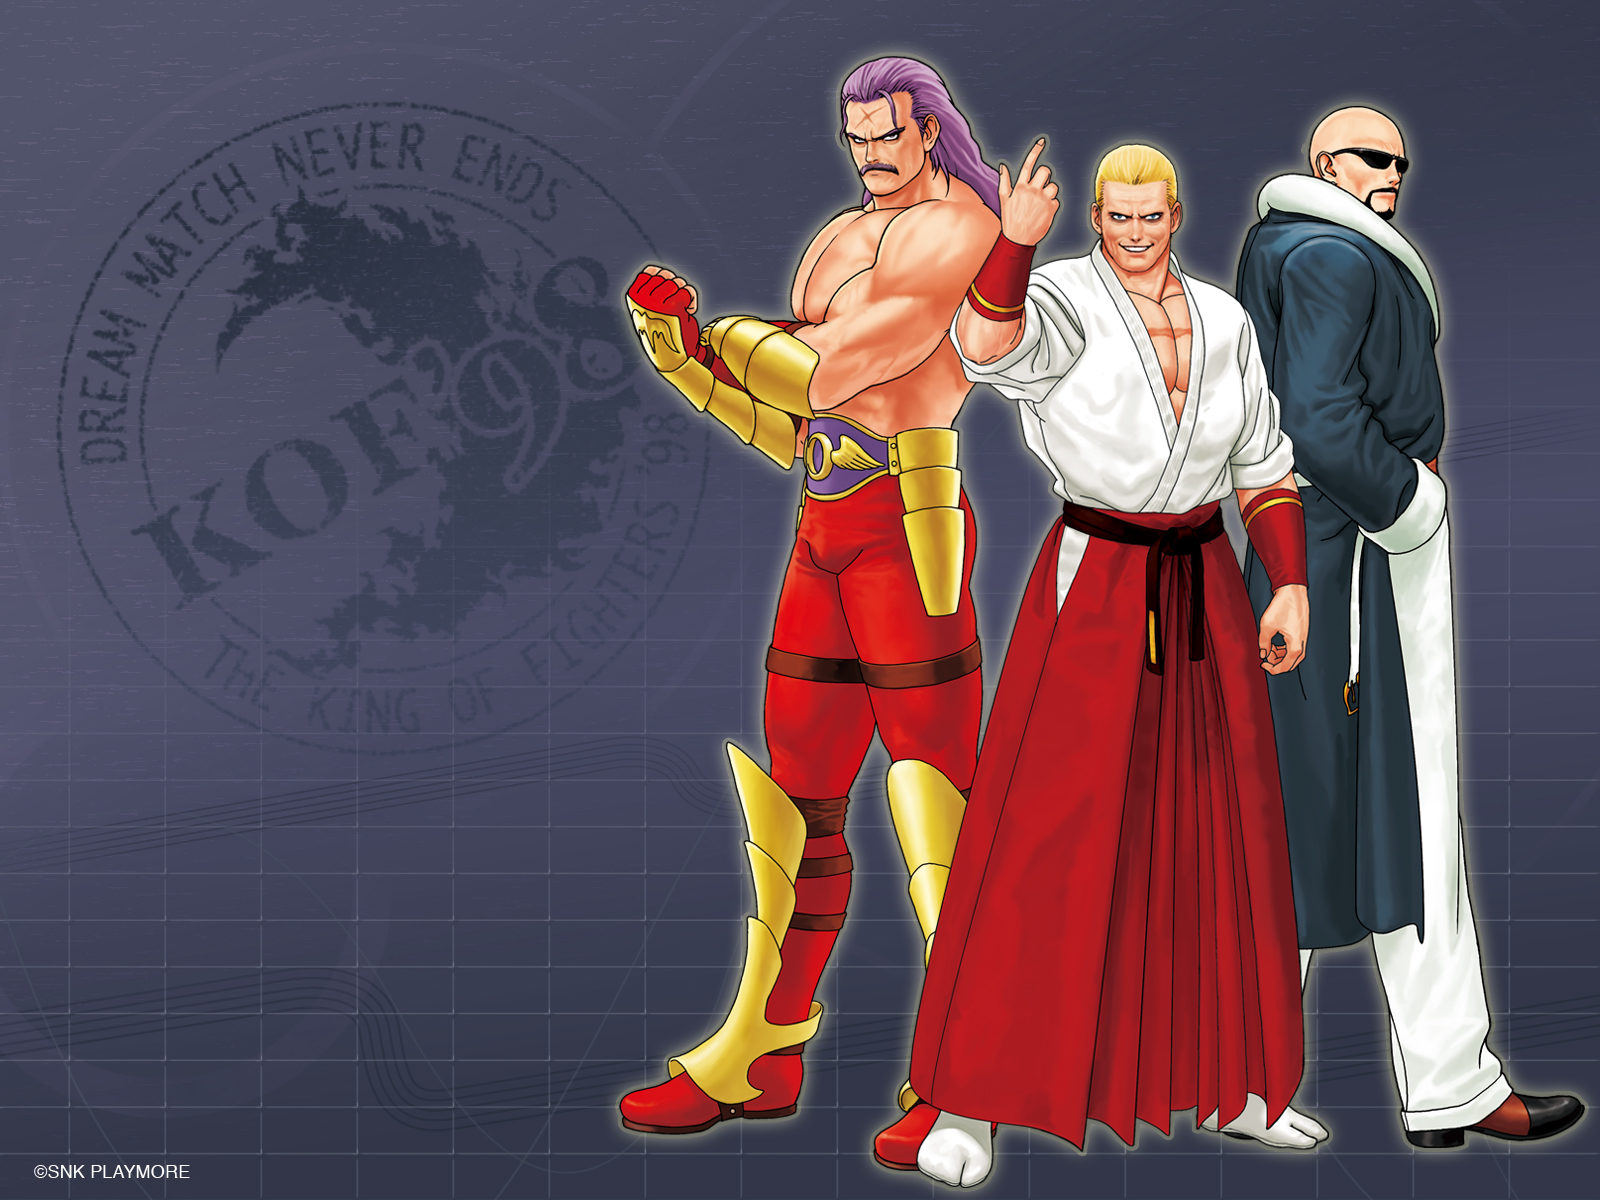 The King Of Fighters Wallpaper 902195 Zerochan Anime Image Board